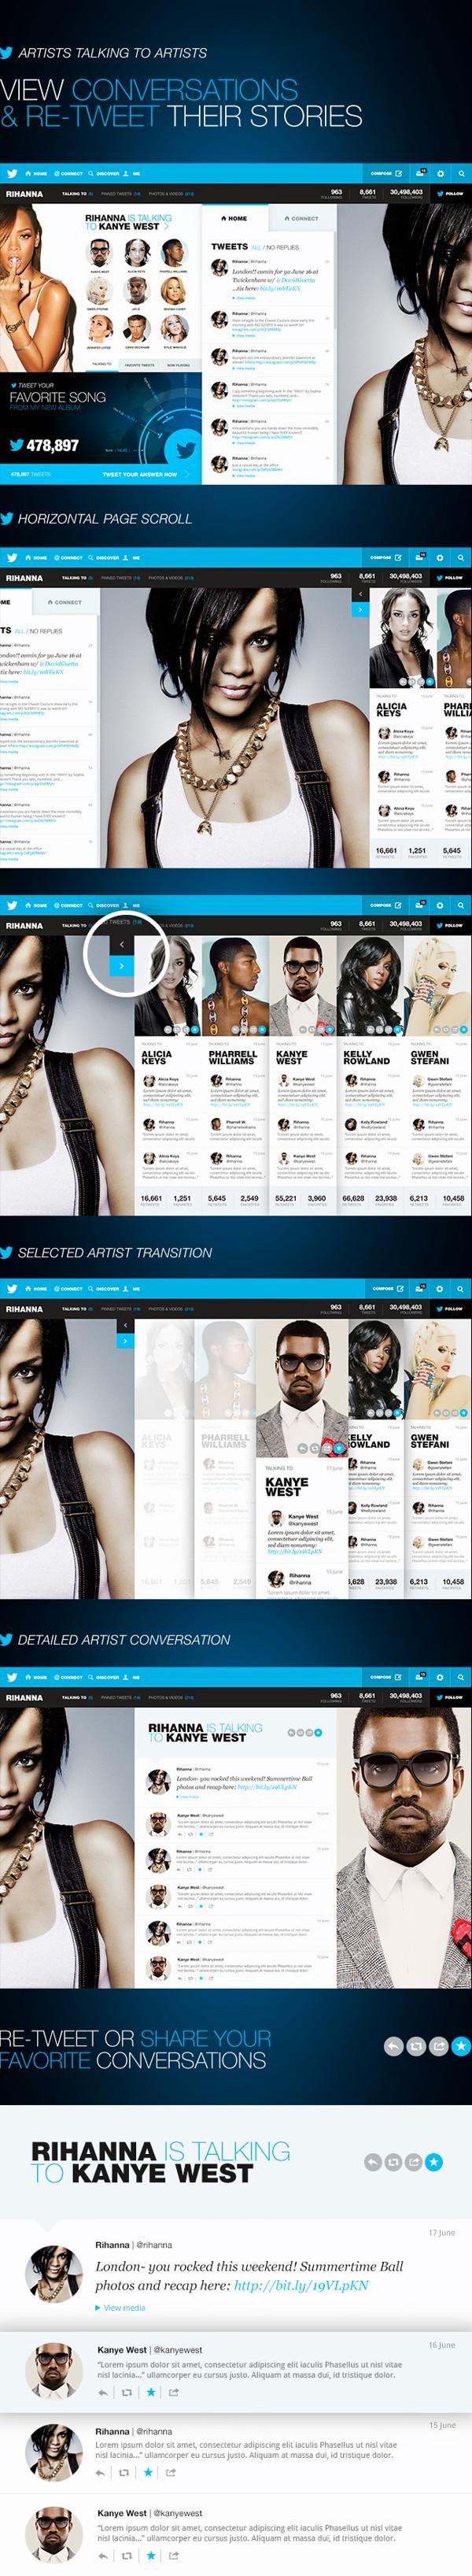 twitter-redesign-2 (1)